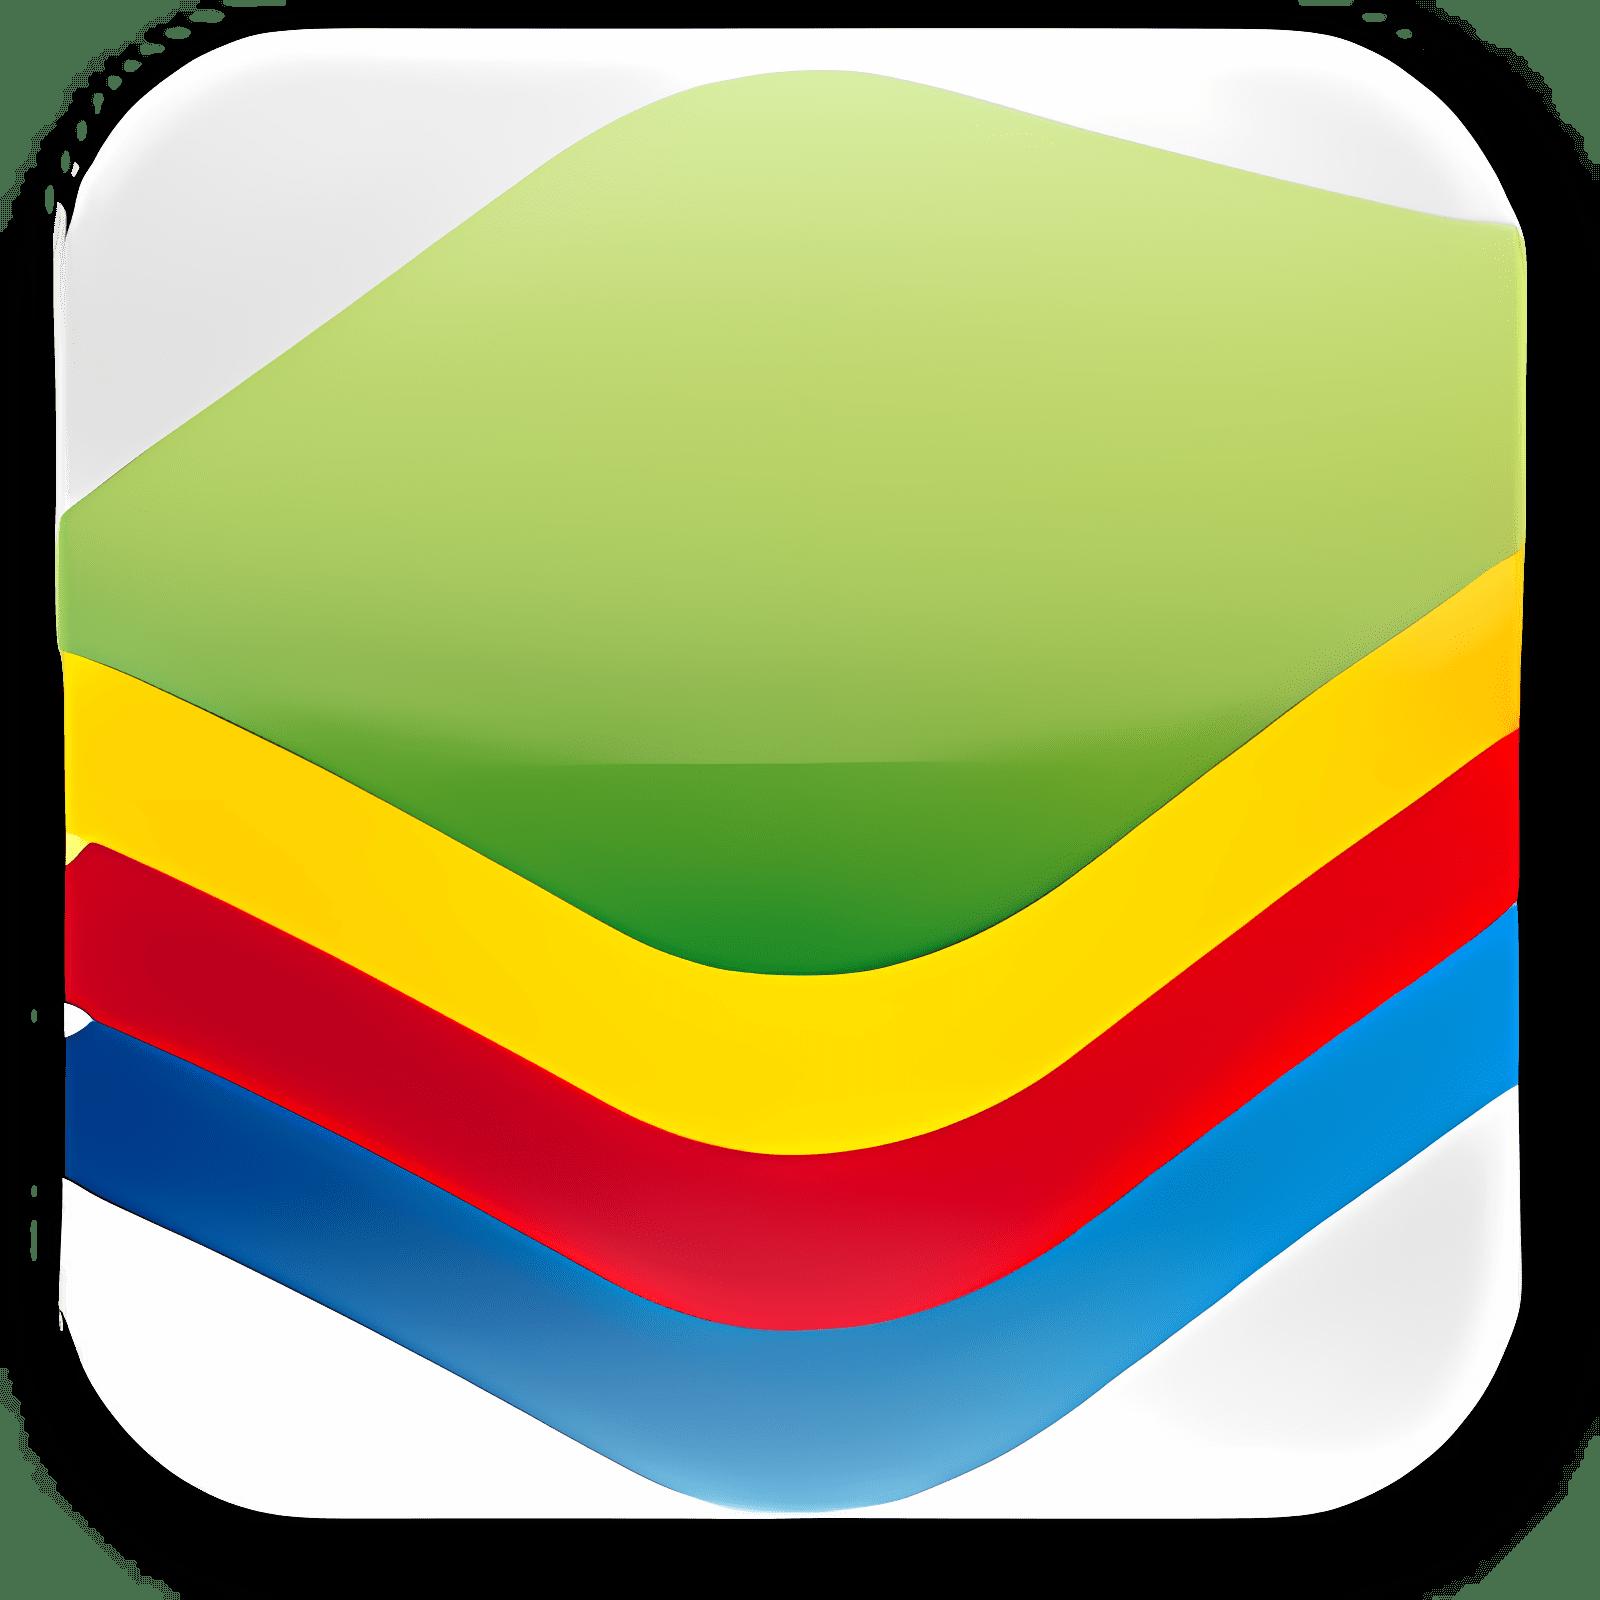 BlueStacks App Player for Windows 10